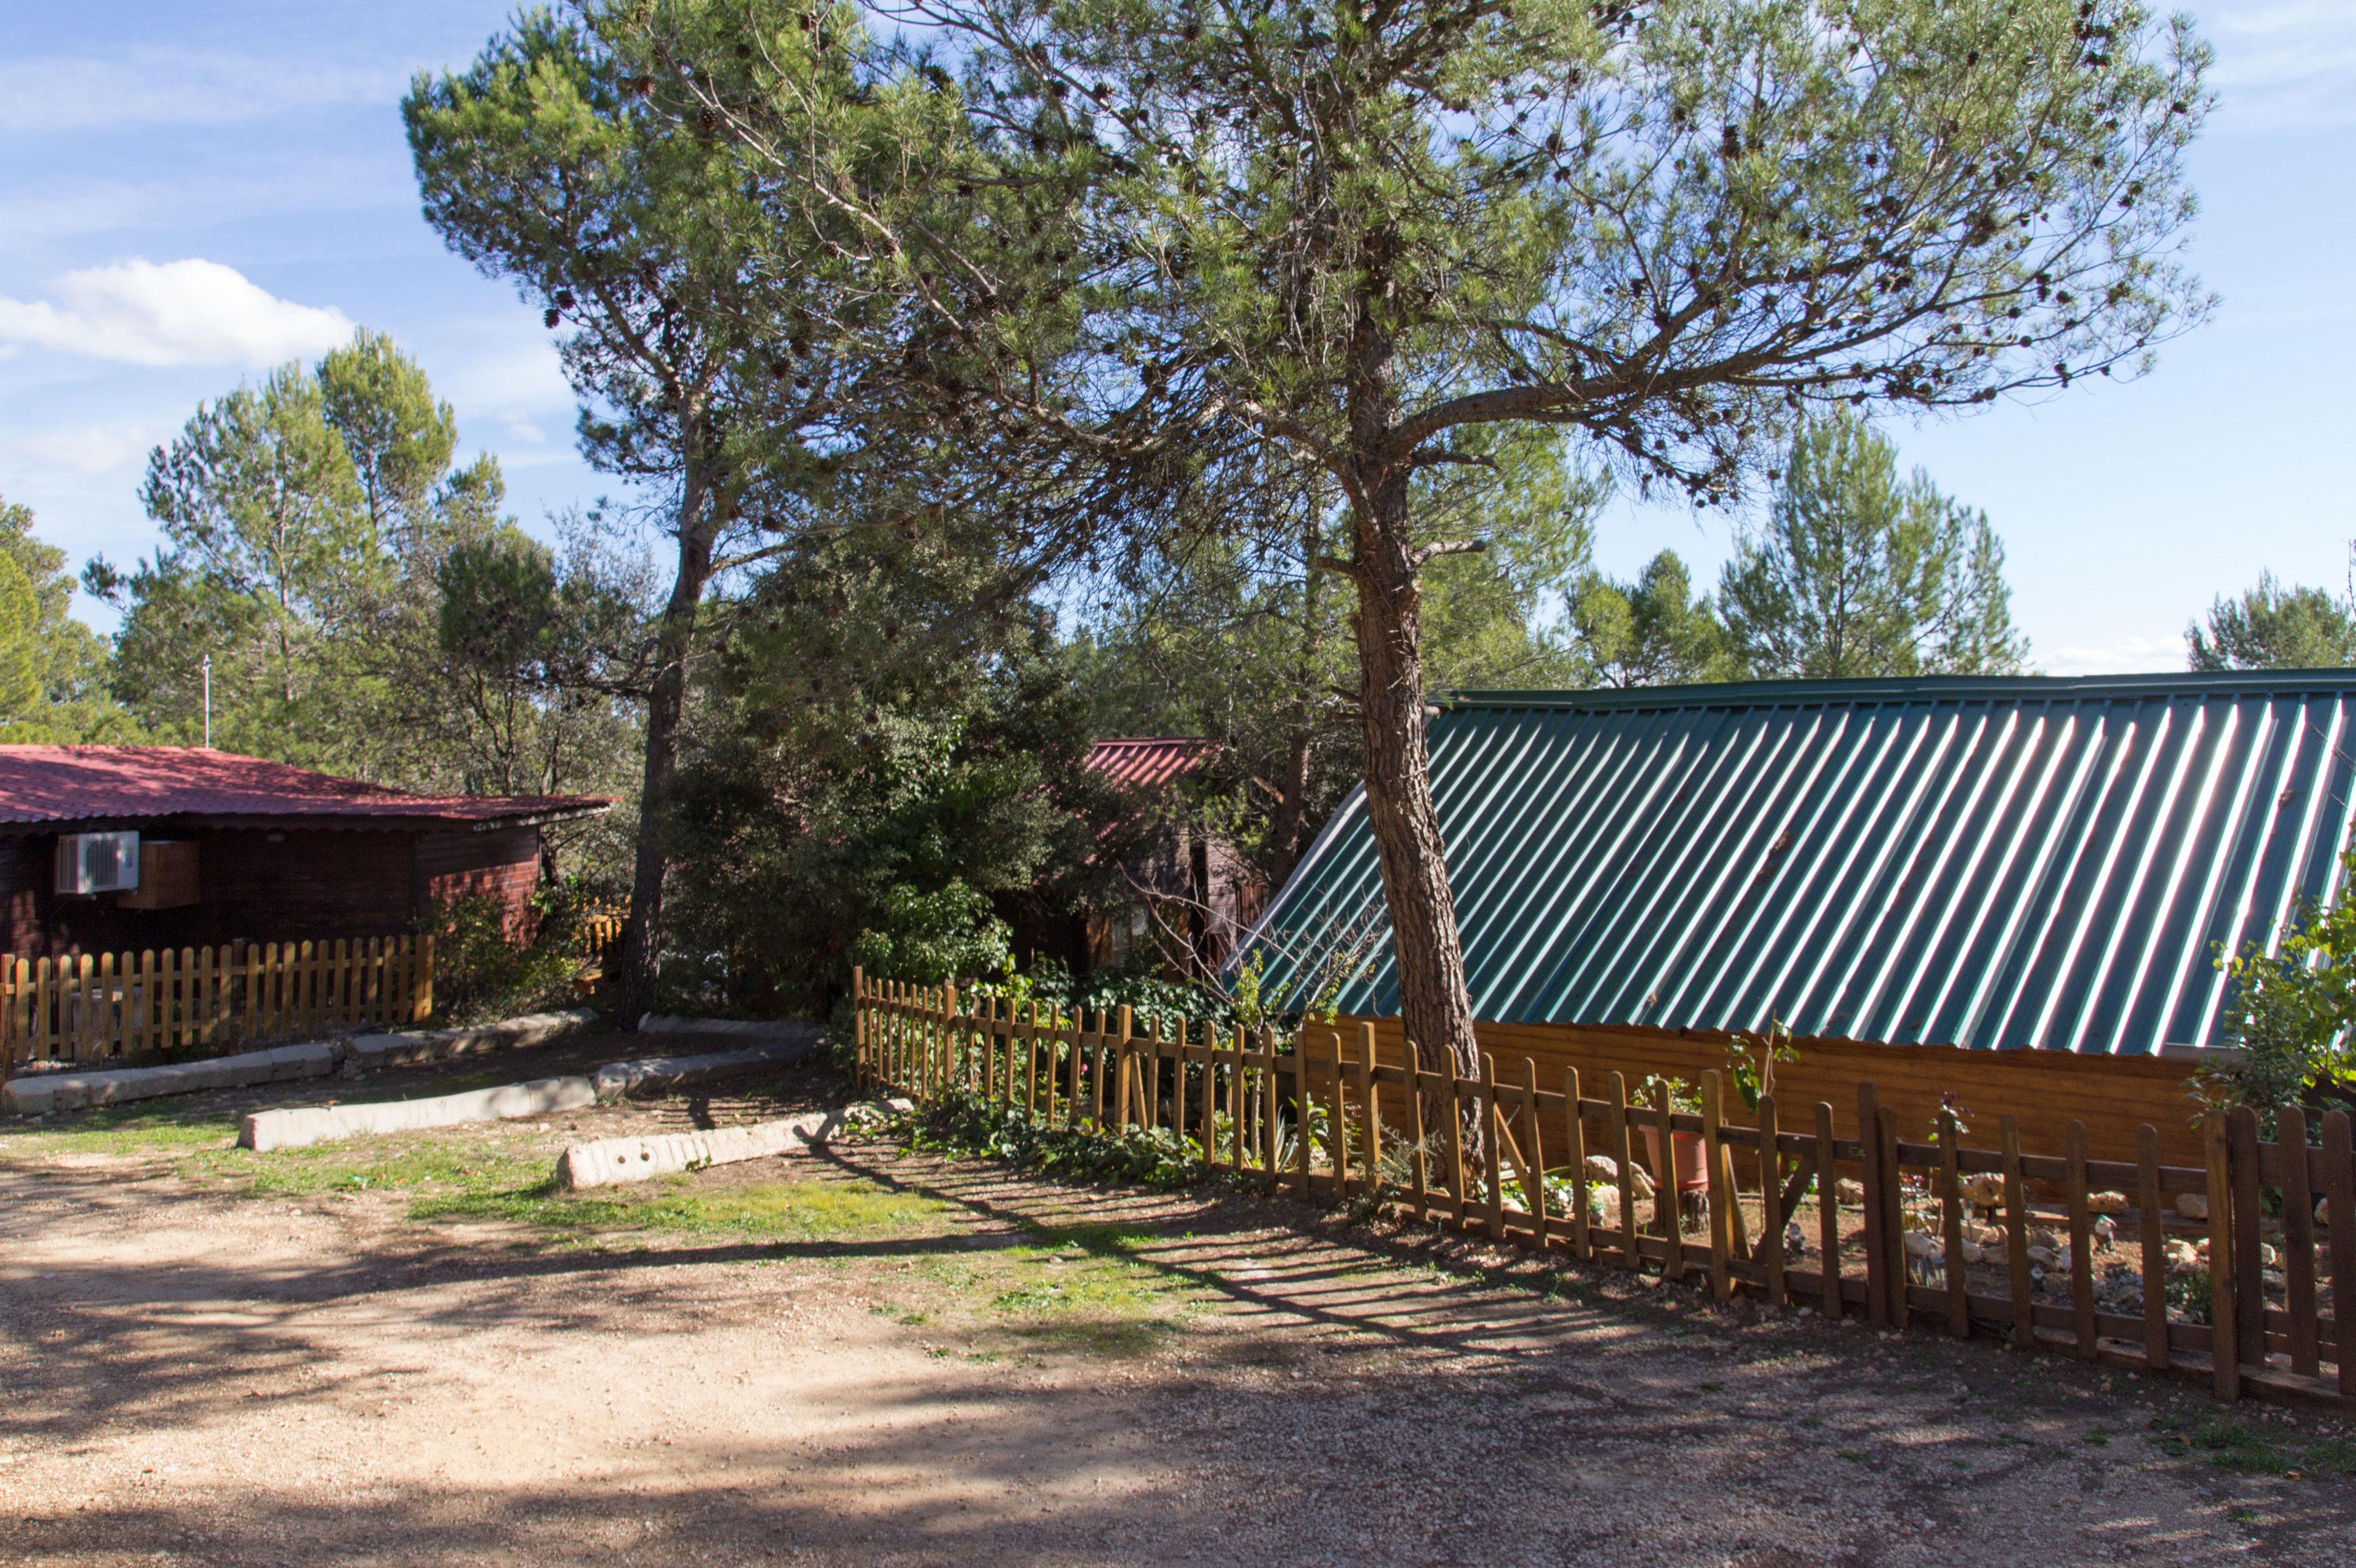 Camping de caravanas en Navalón, Enguera, Valencia